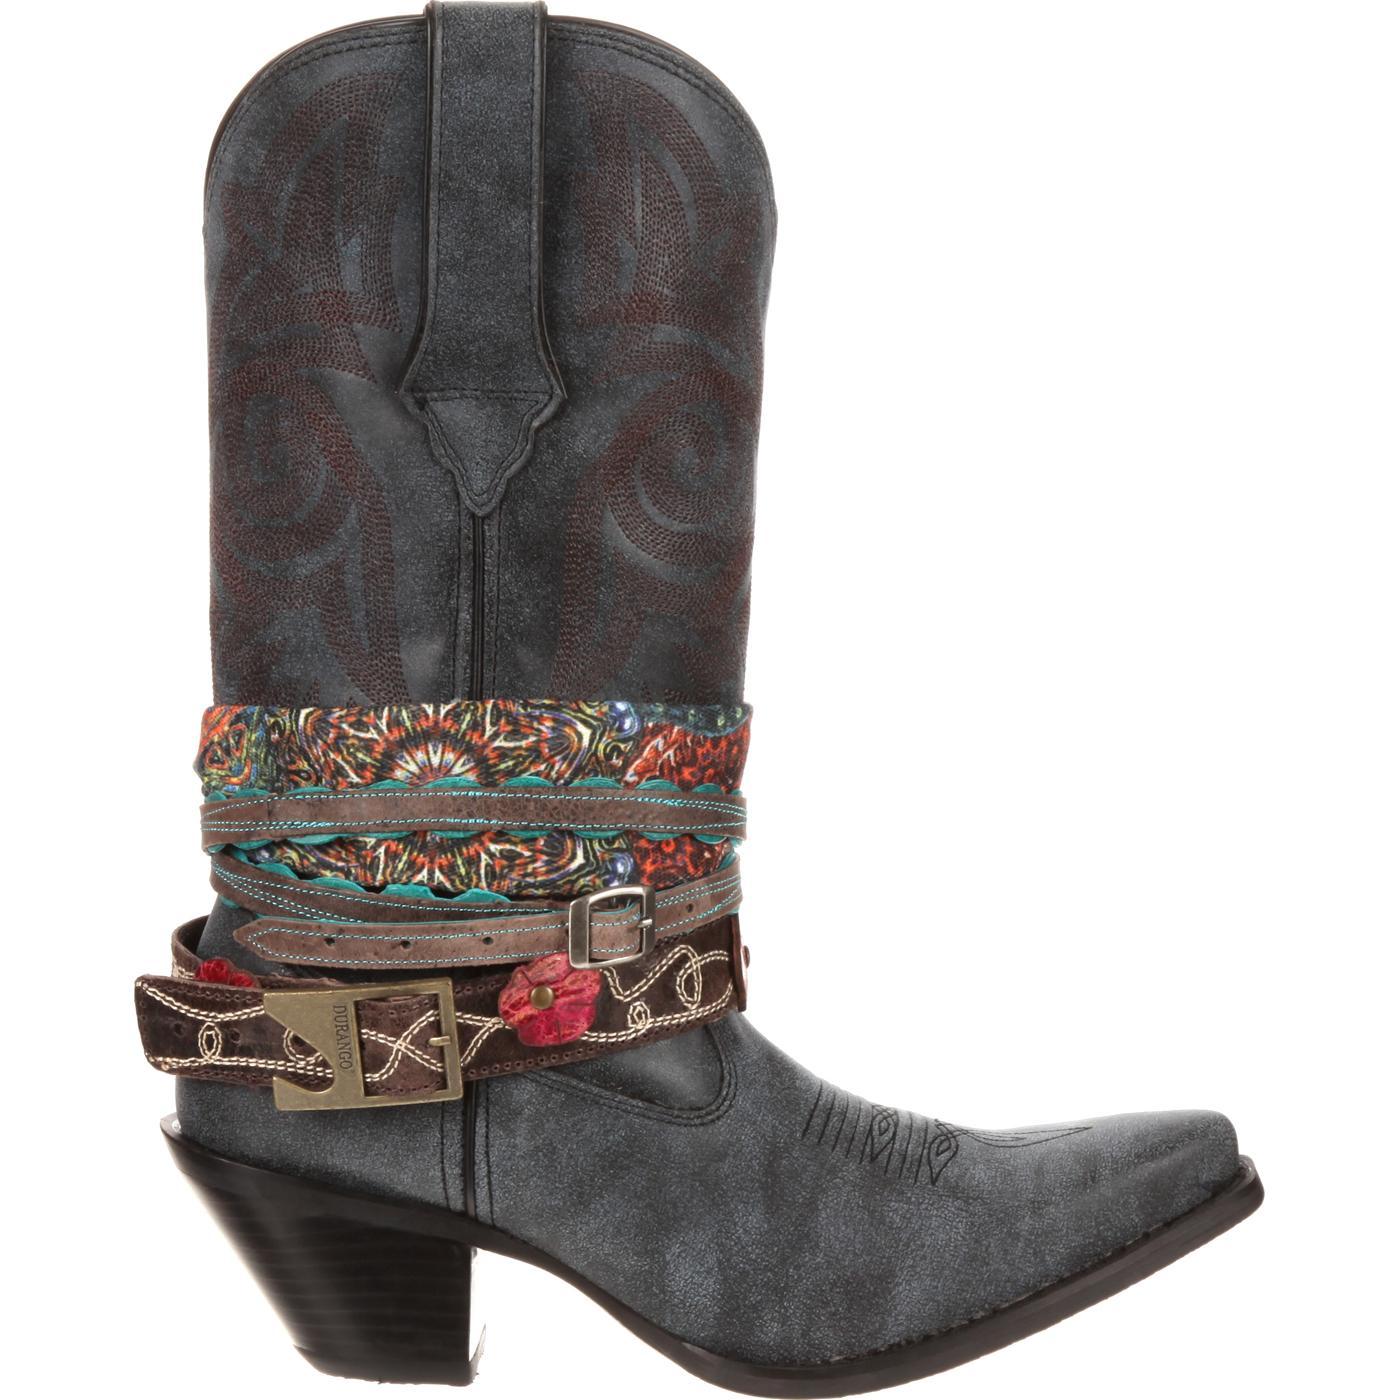 Durango Womens Brown Boots 12 Inch Accessorize